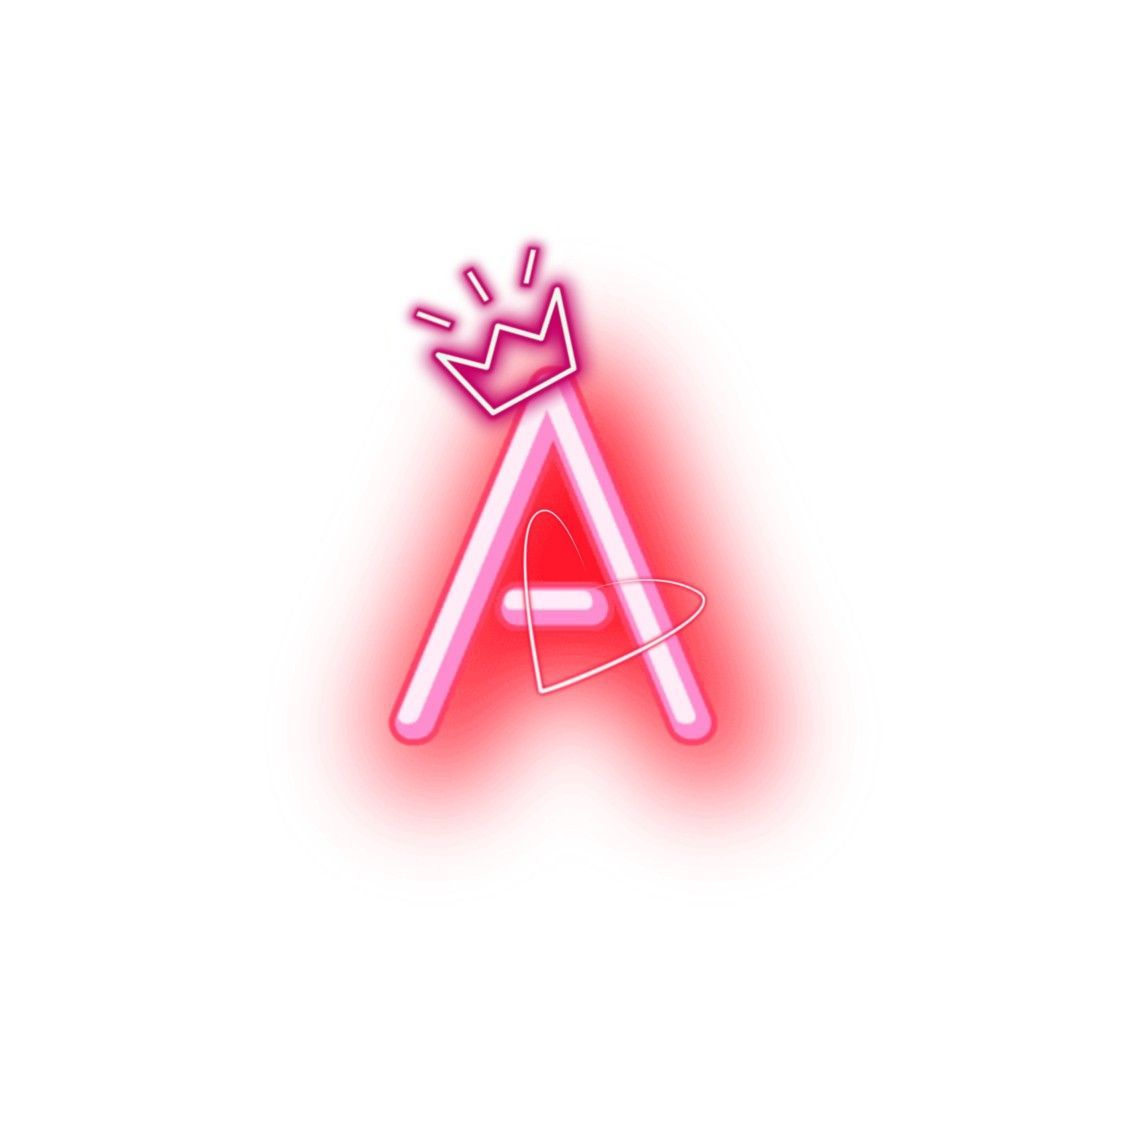 Pin By Noor On Lrʰabetŝ Alphabet Images Cute Wallpaper For Phone Alphabet Wallpaper